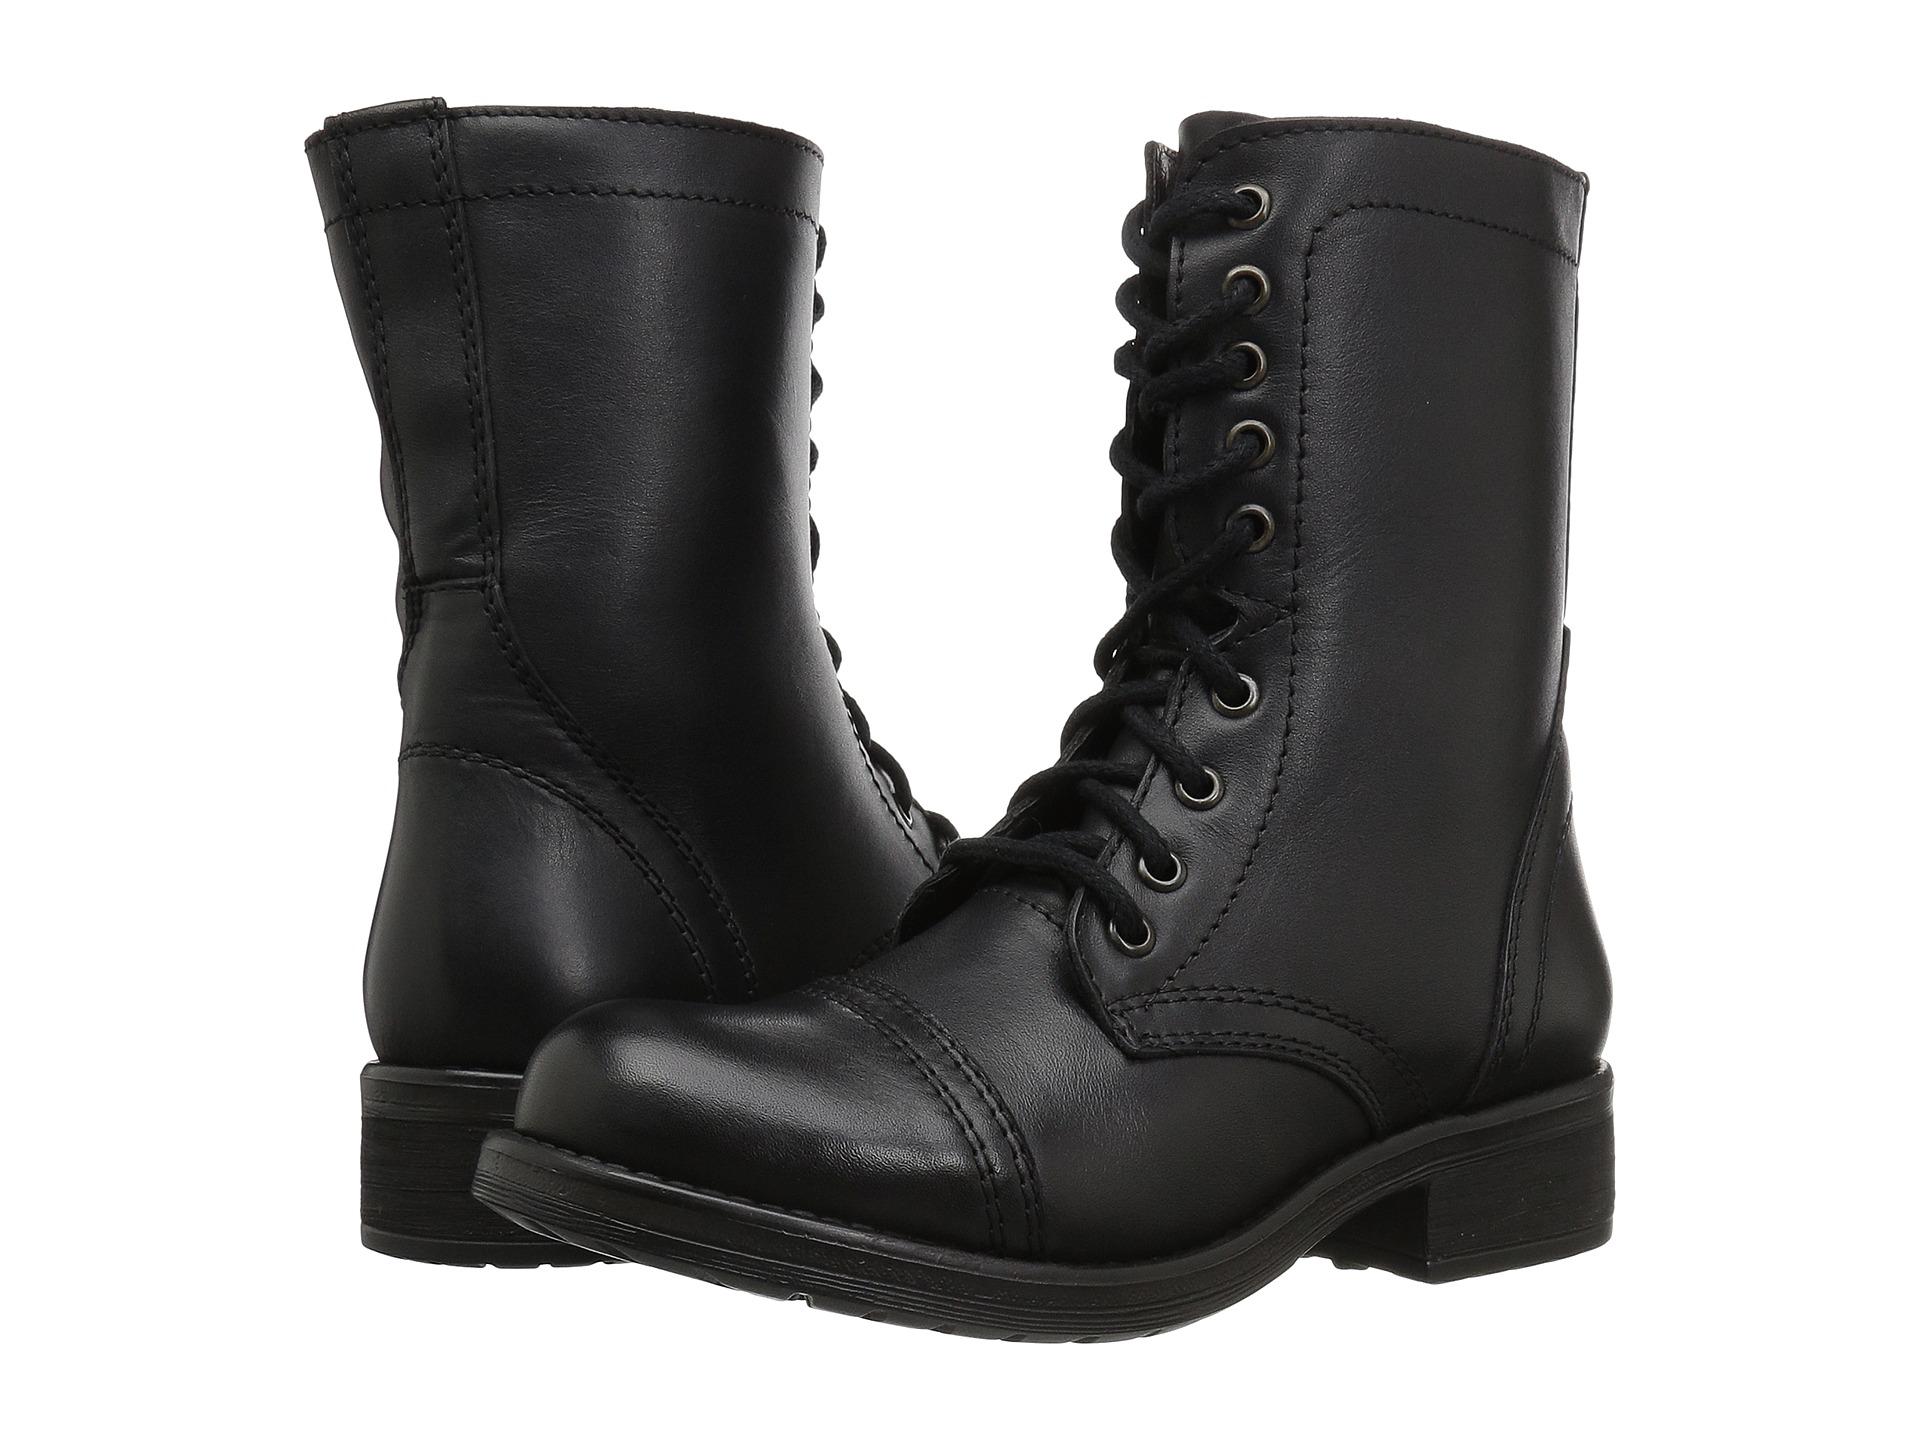 best s black combat boots top 5 reviews list for